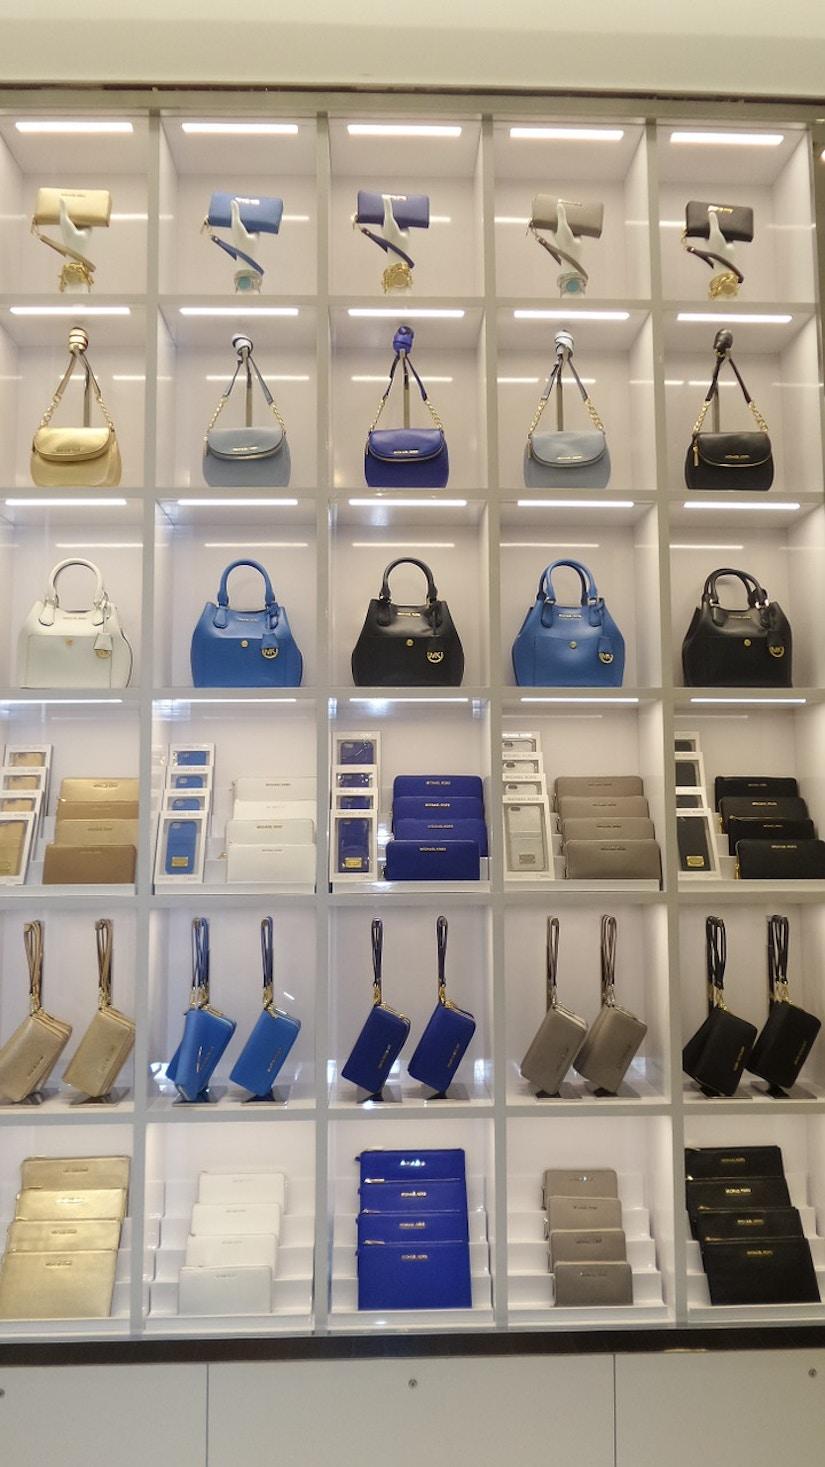 Auswahl an verschiedenen Handtaschentypen in verschiedenen Farben